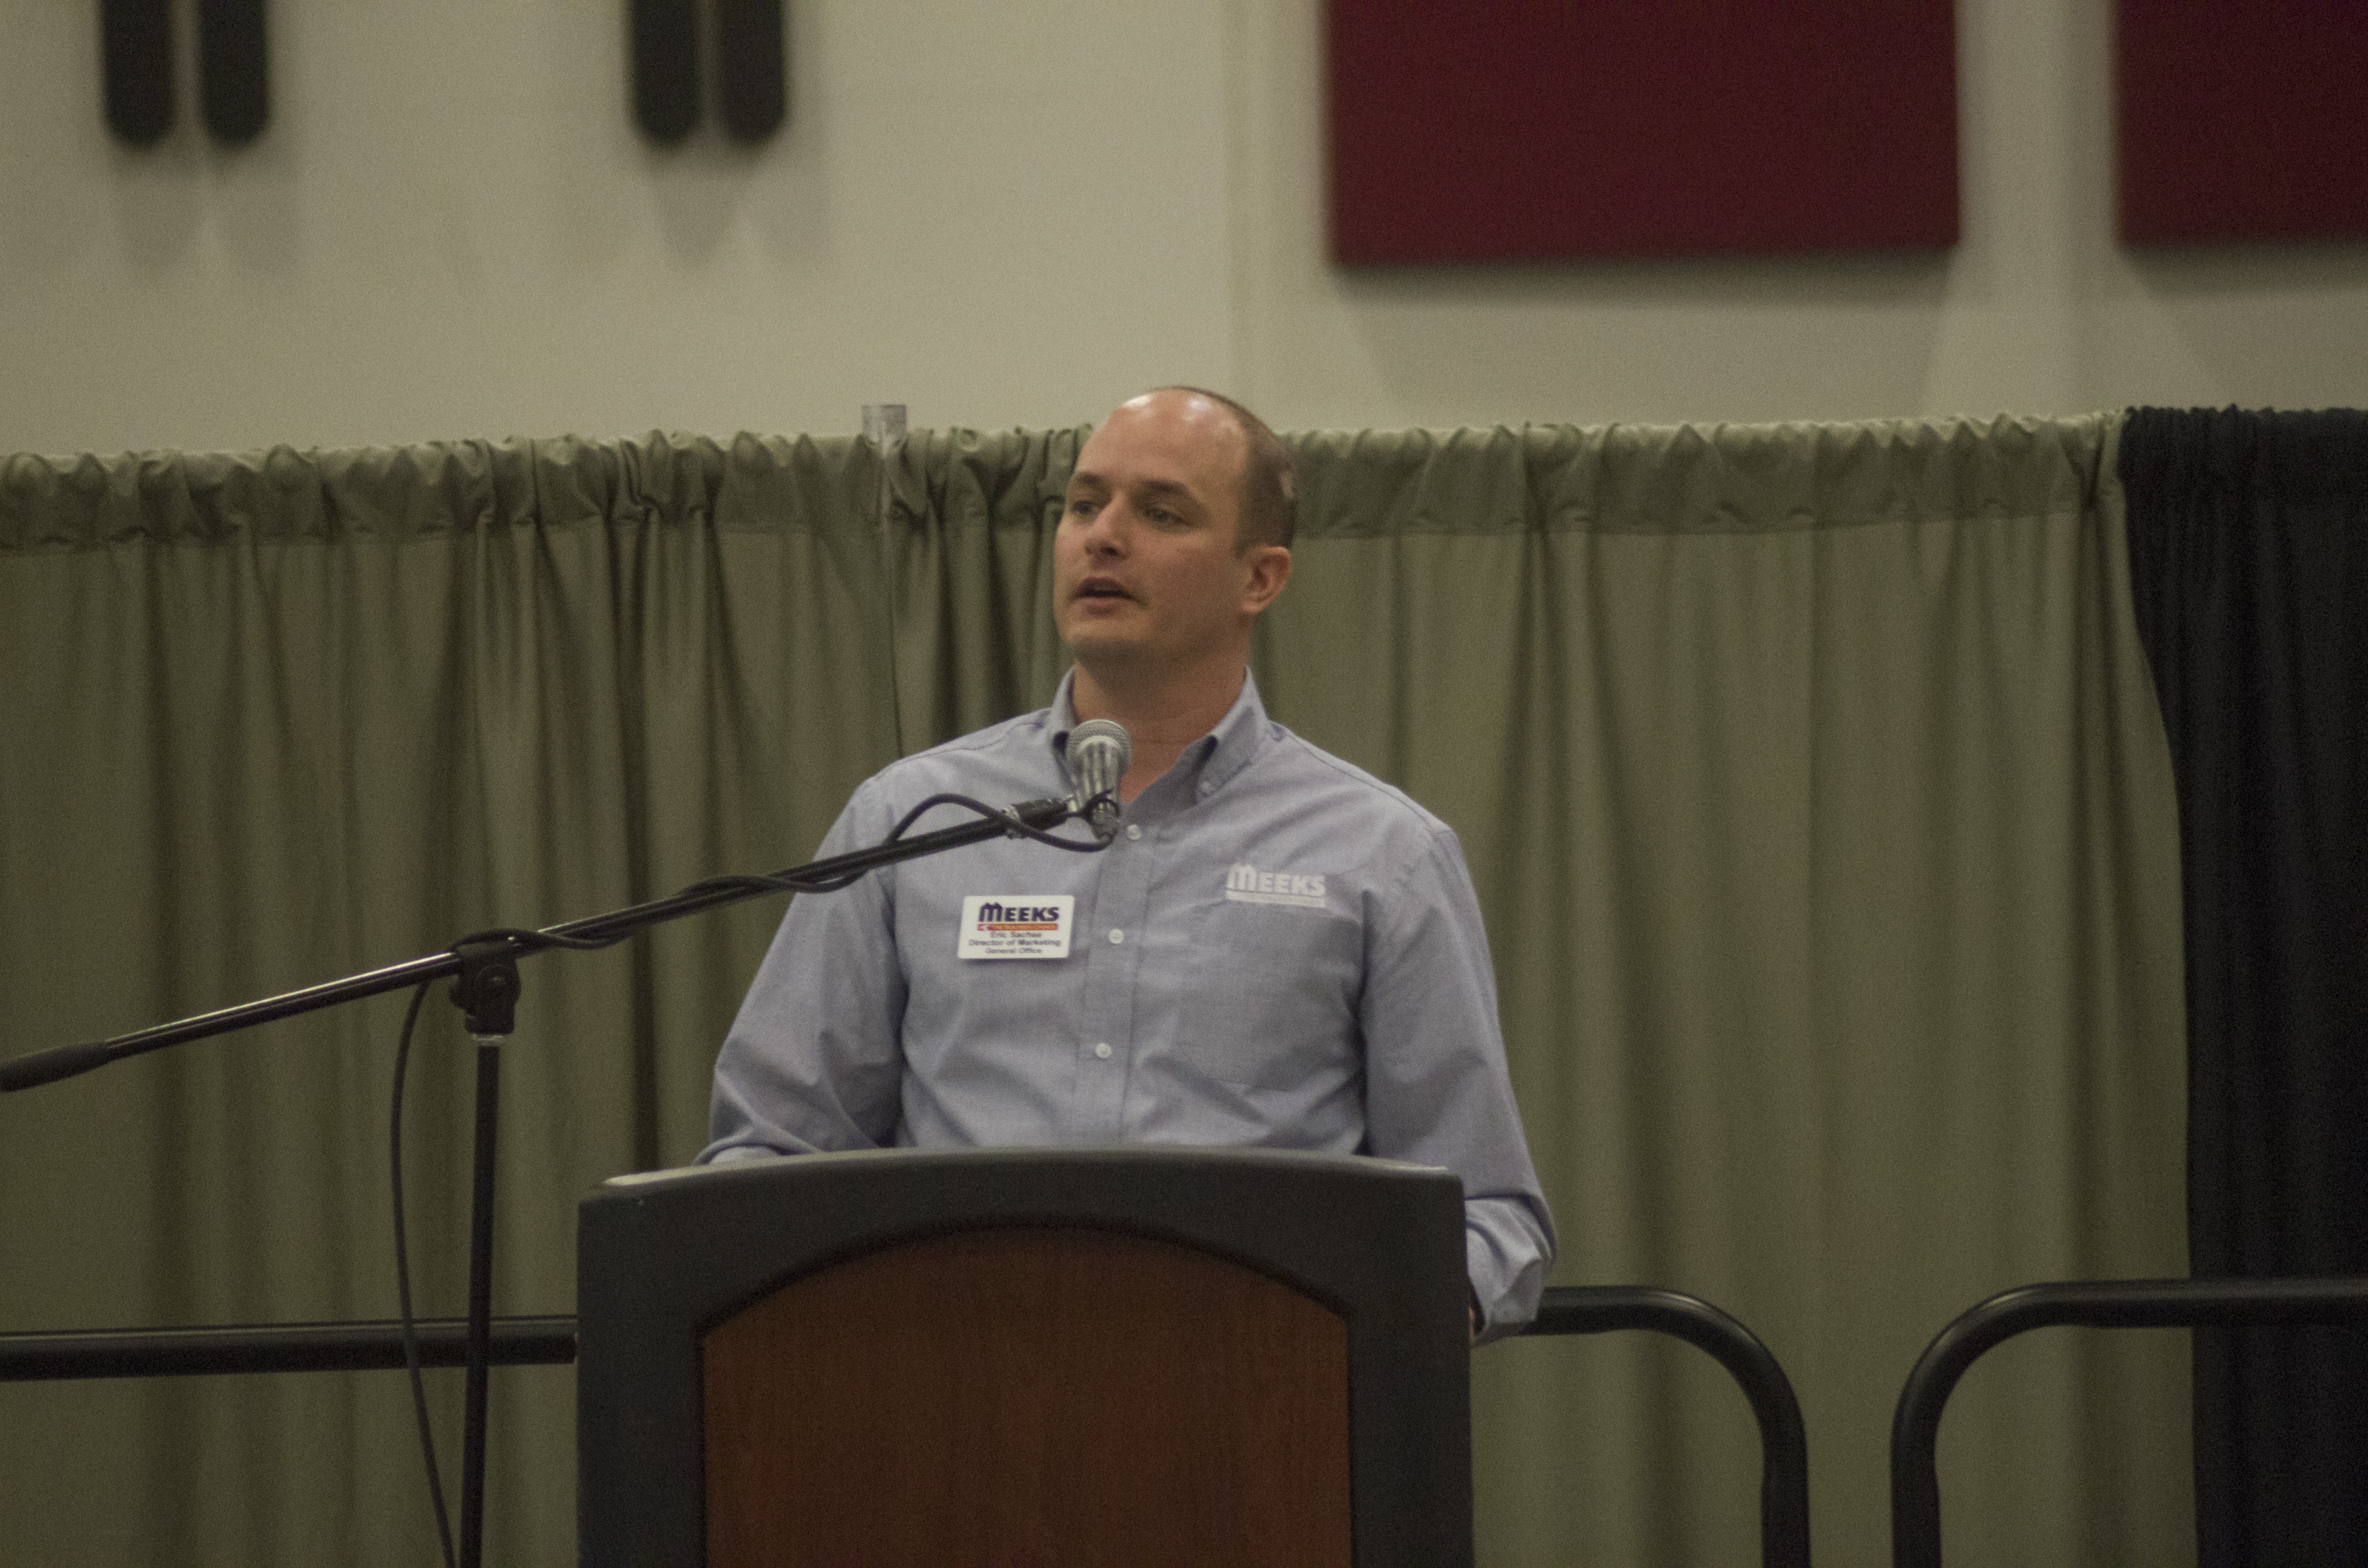 Eric Sachse: Alumnus Stays Involved with Missouri State